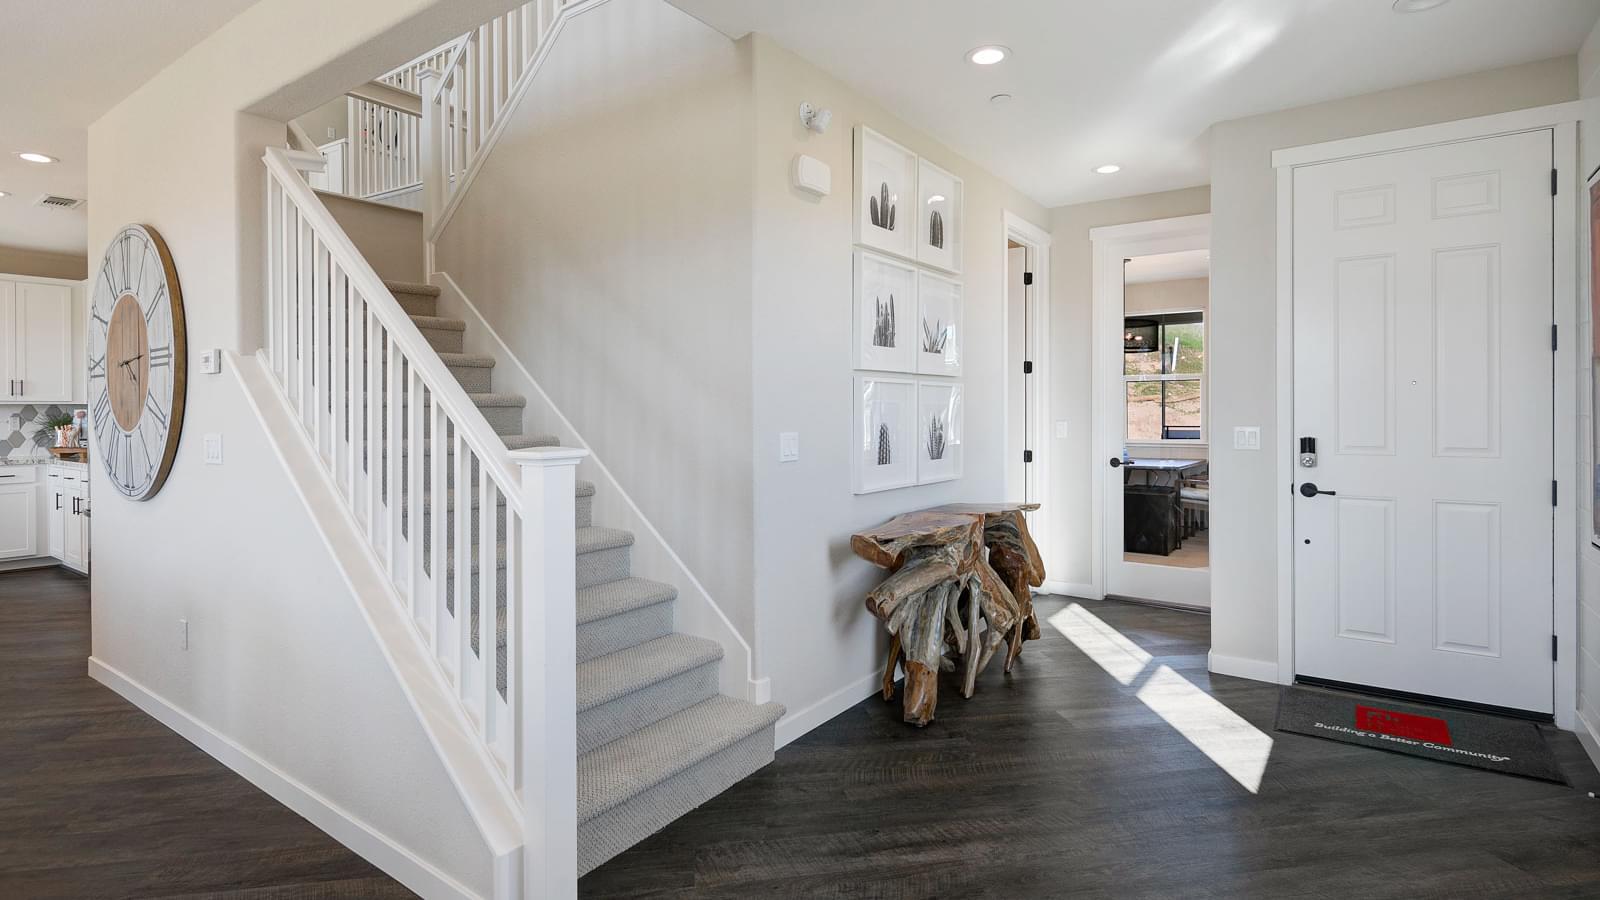 Residence 2 Entry